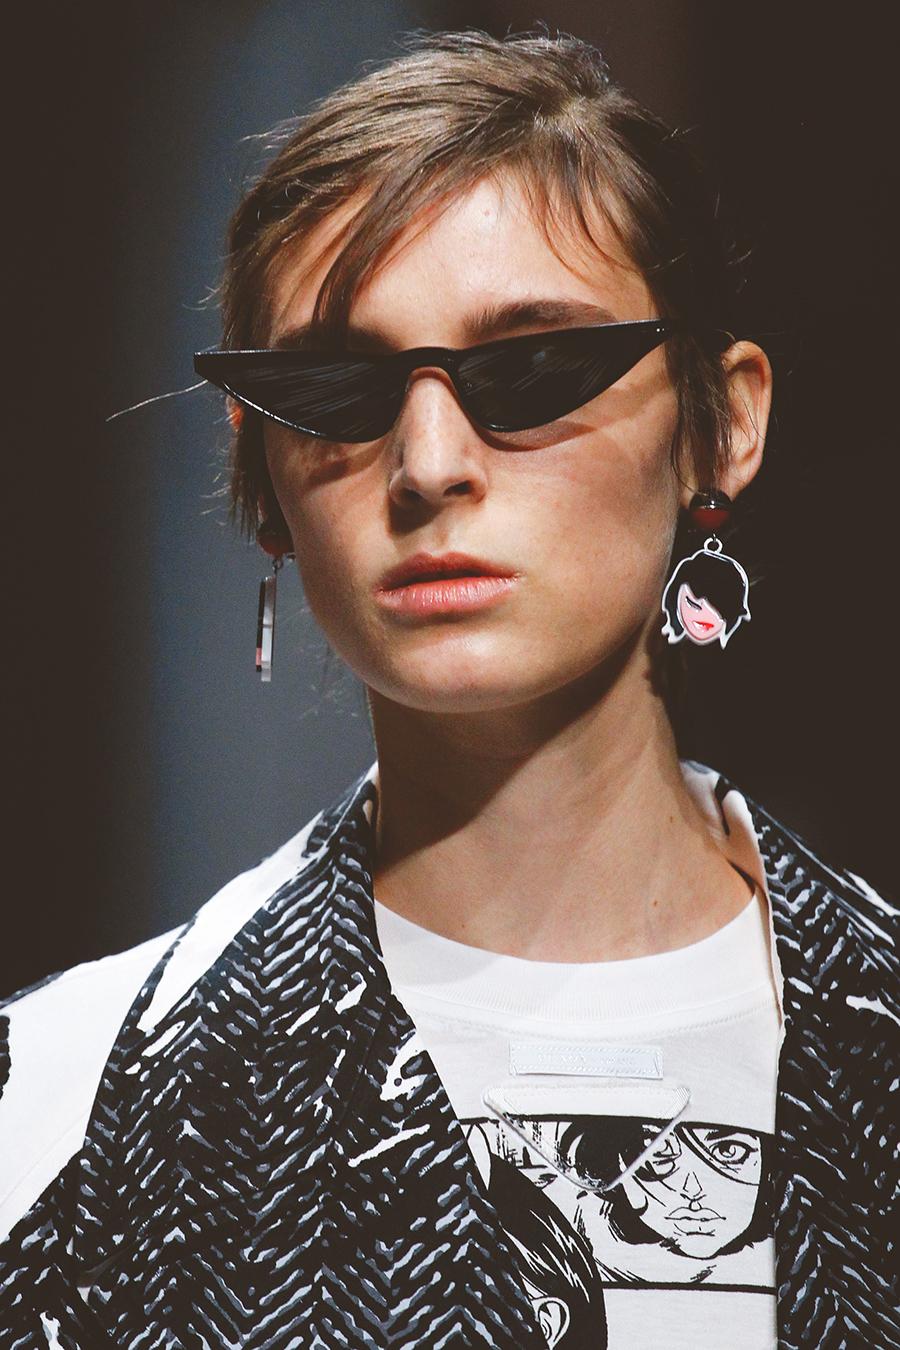 Trend Report | 90's Sunglasses